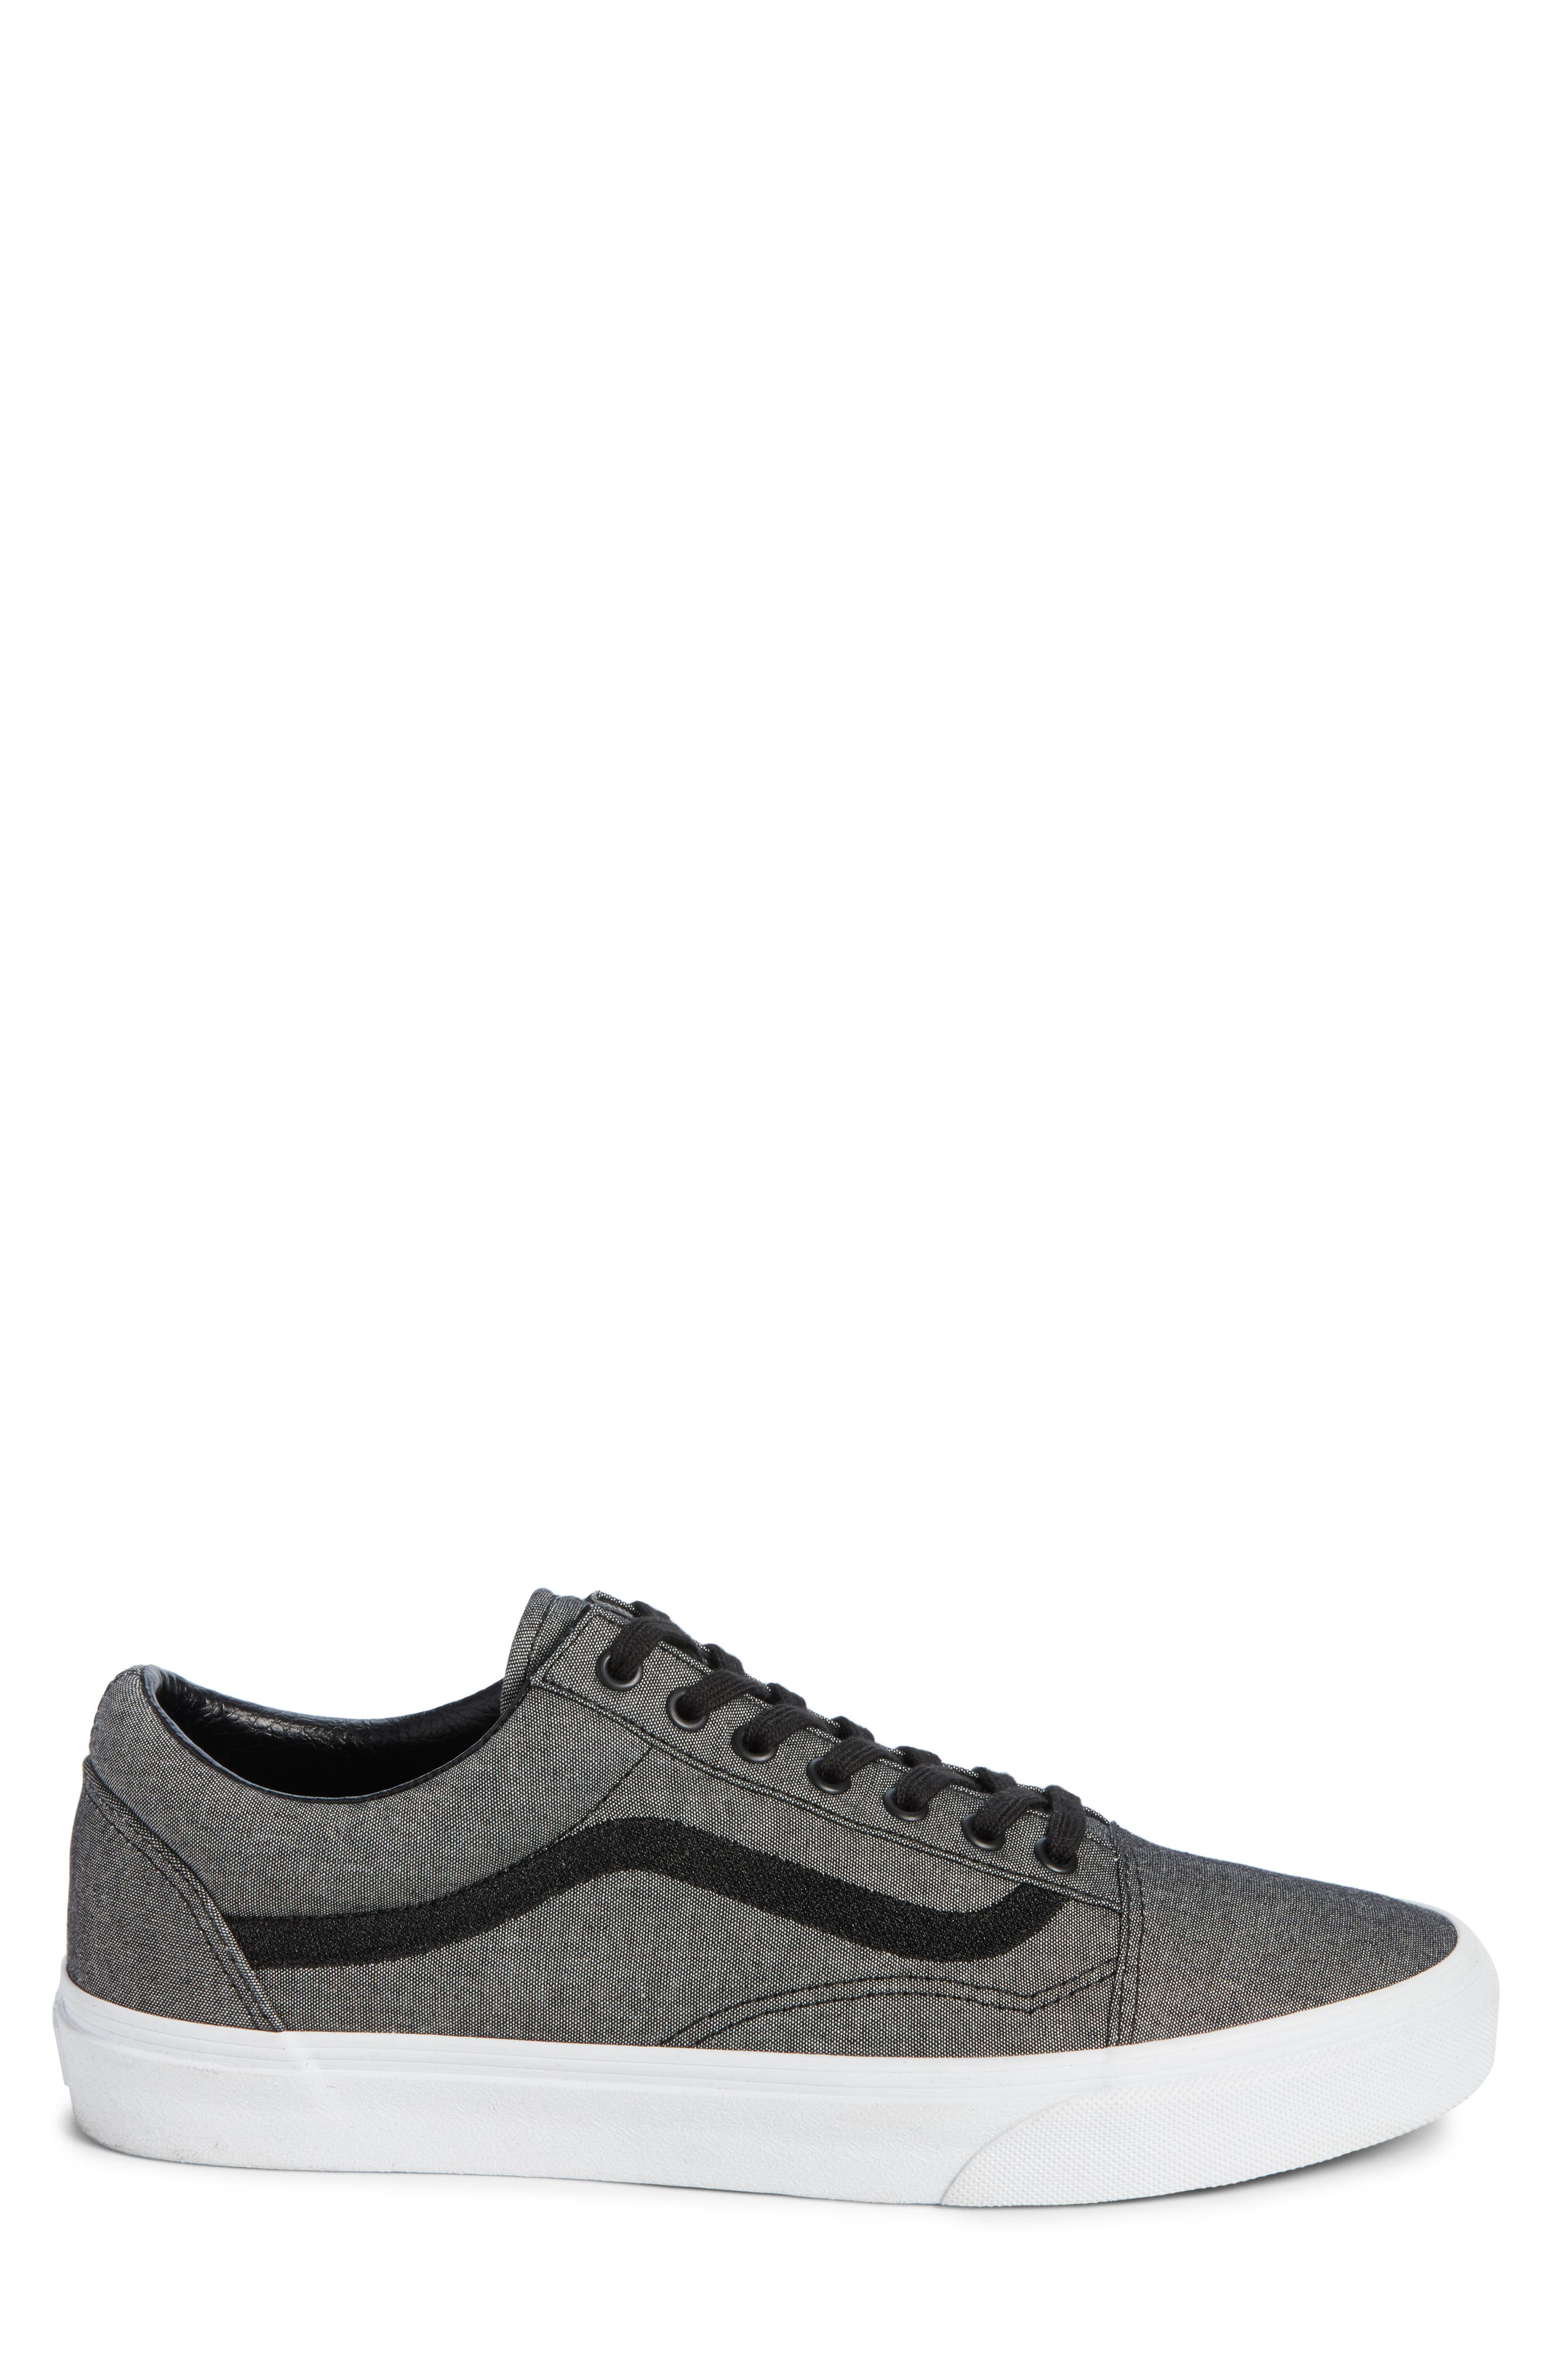 Old Skool Sneaker,                             Alternate thumbnail 3, color,                             Black/ True White/ Grey